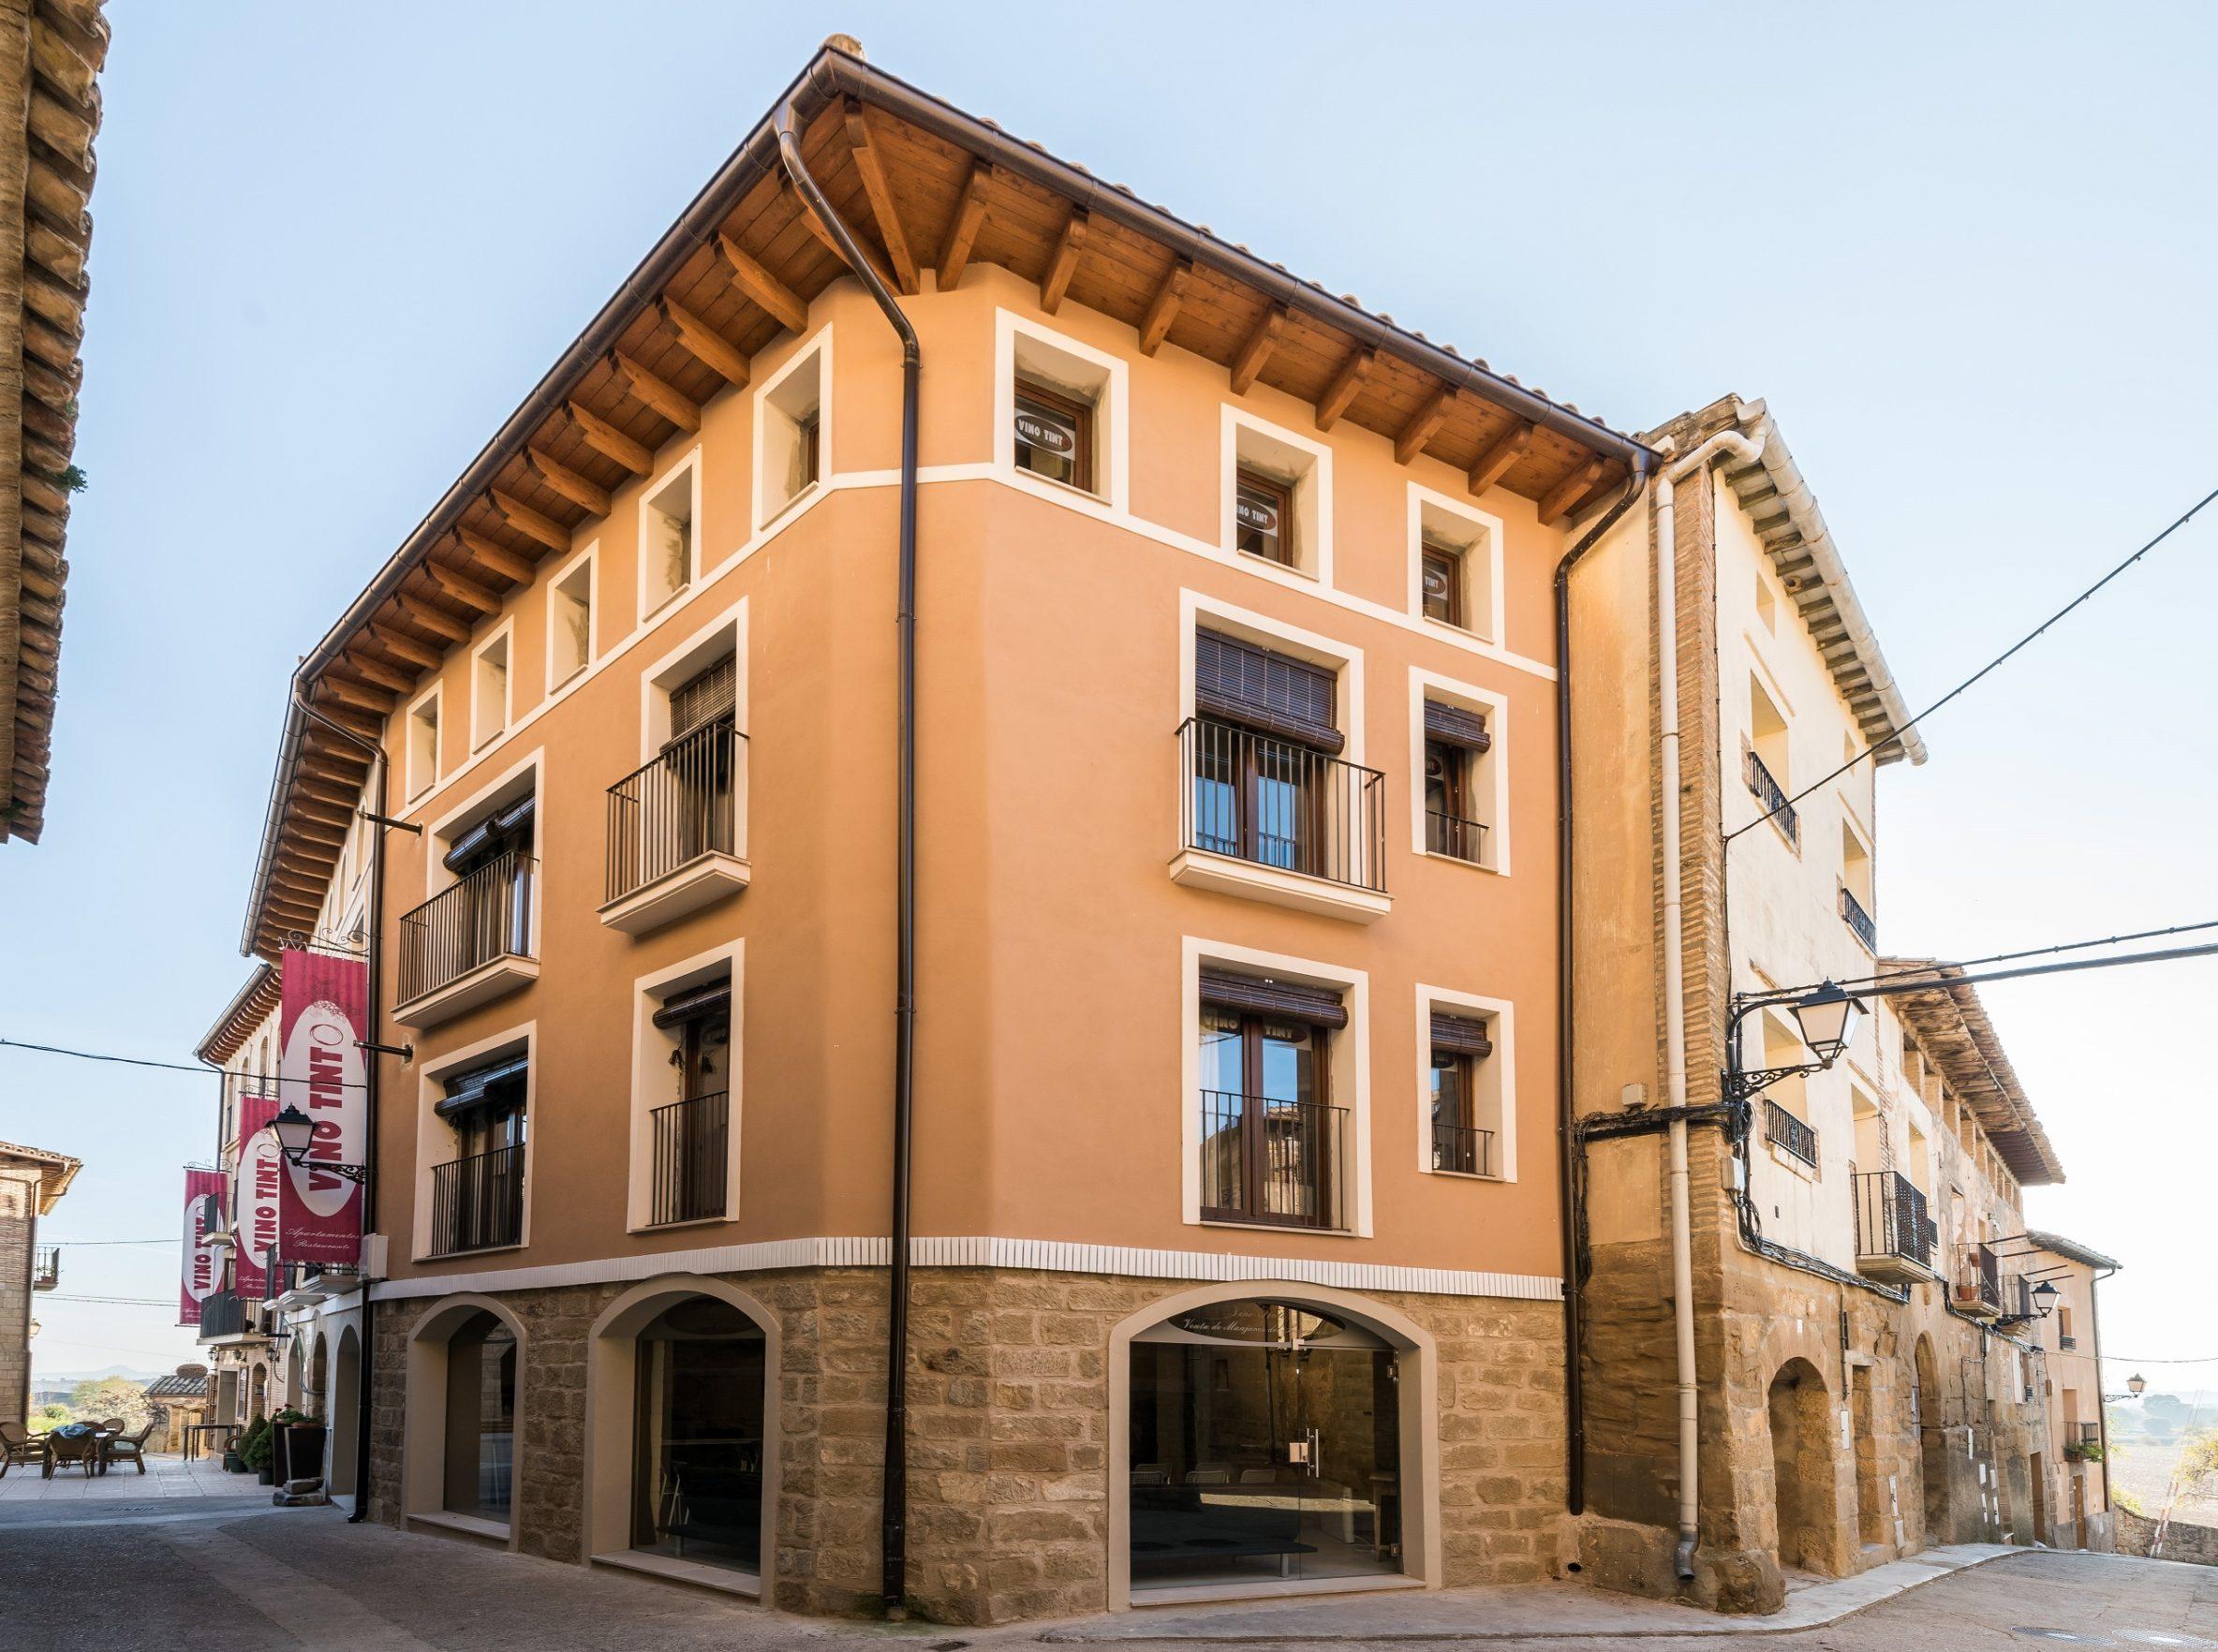 Apartamentos vino tinto scaled e1587054331210 - Where to rest-Sierra y Cañones de Guara